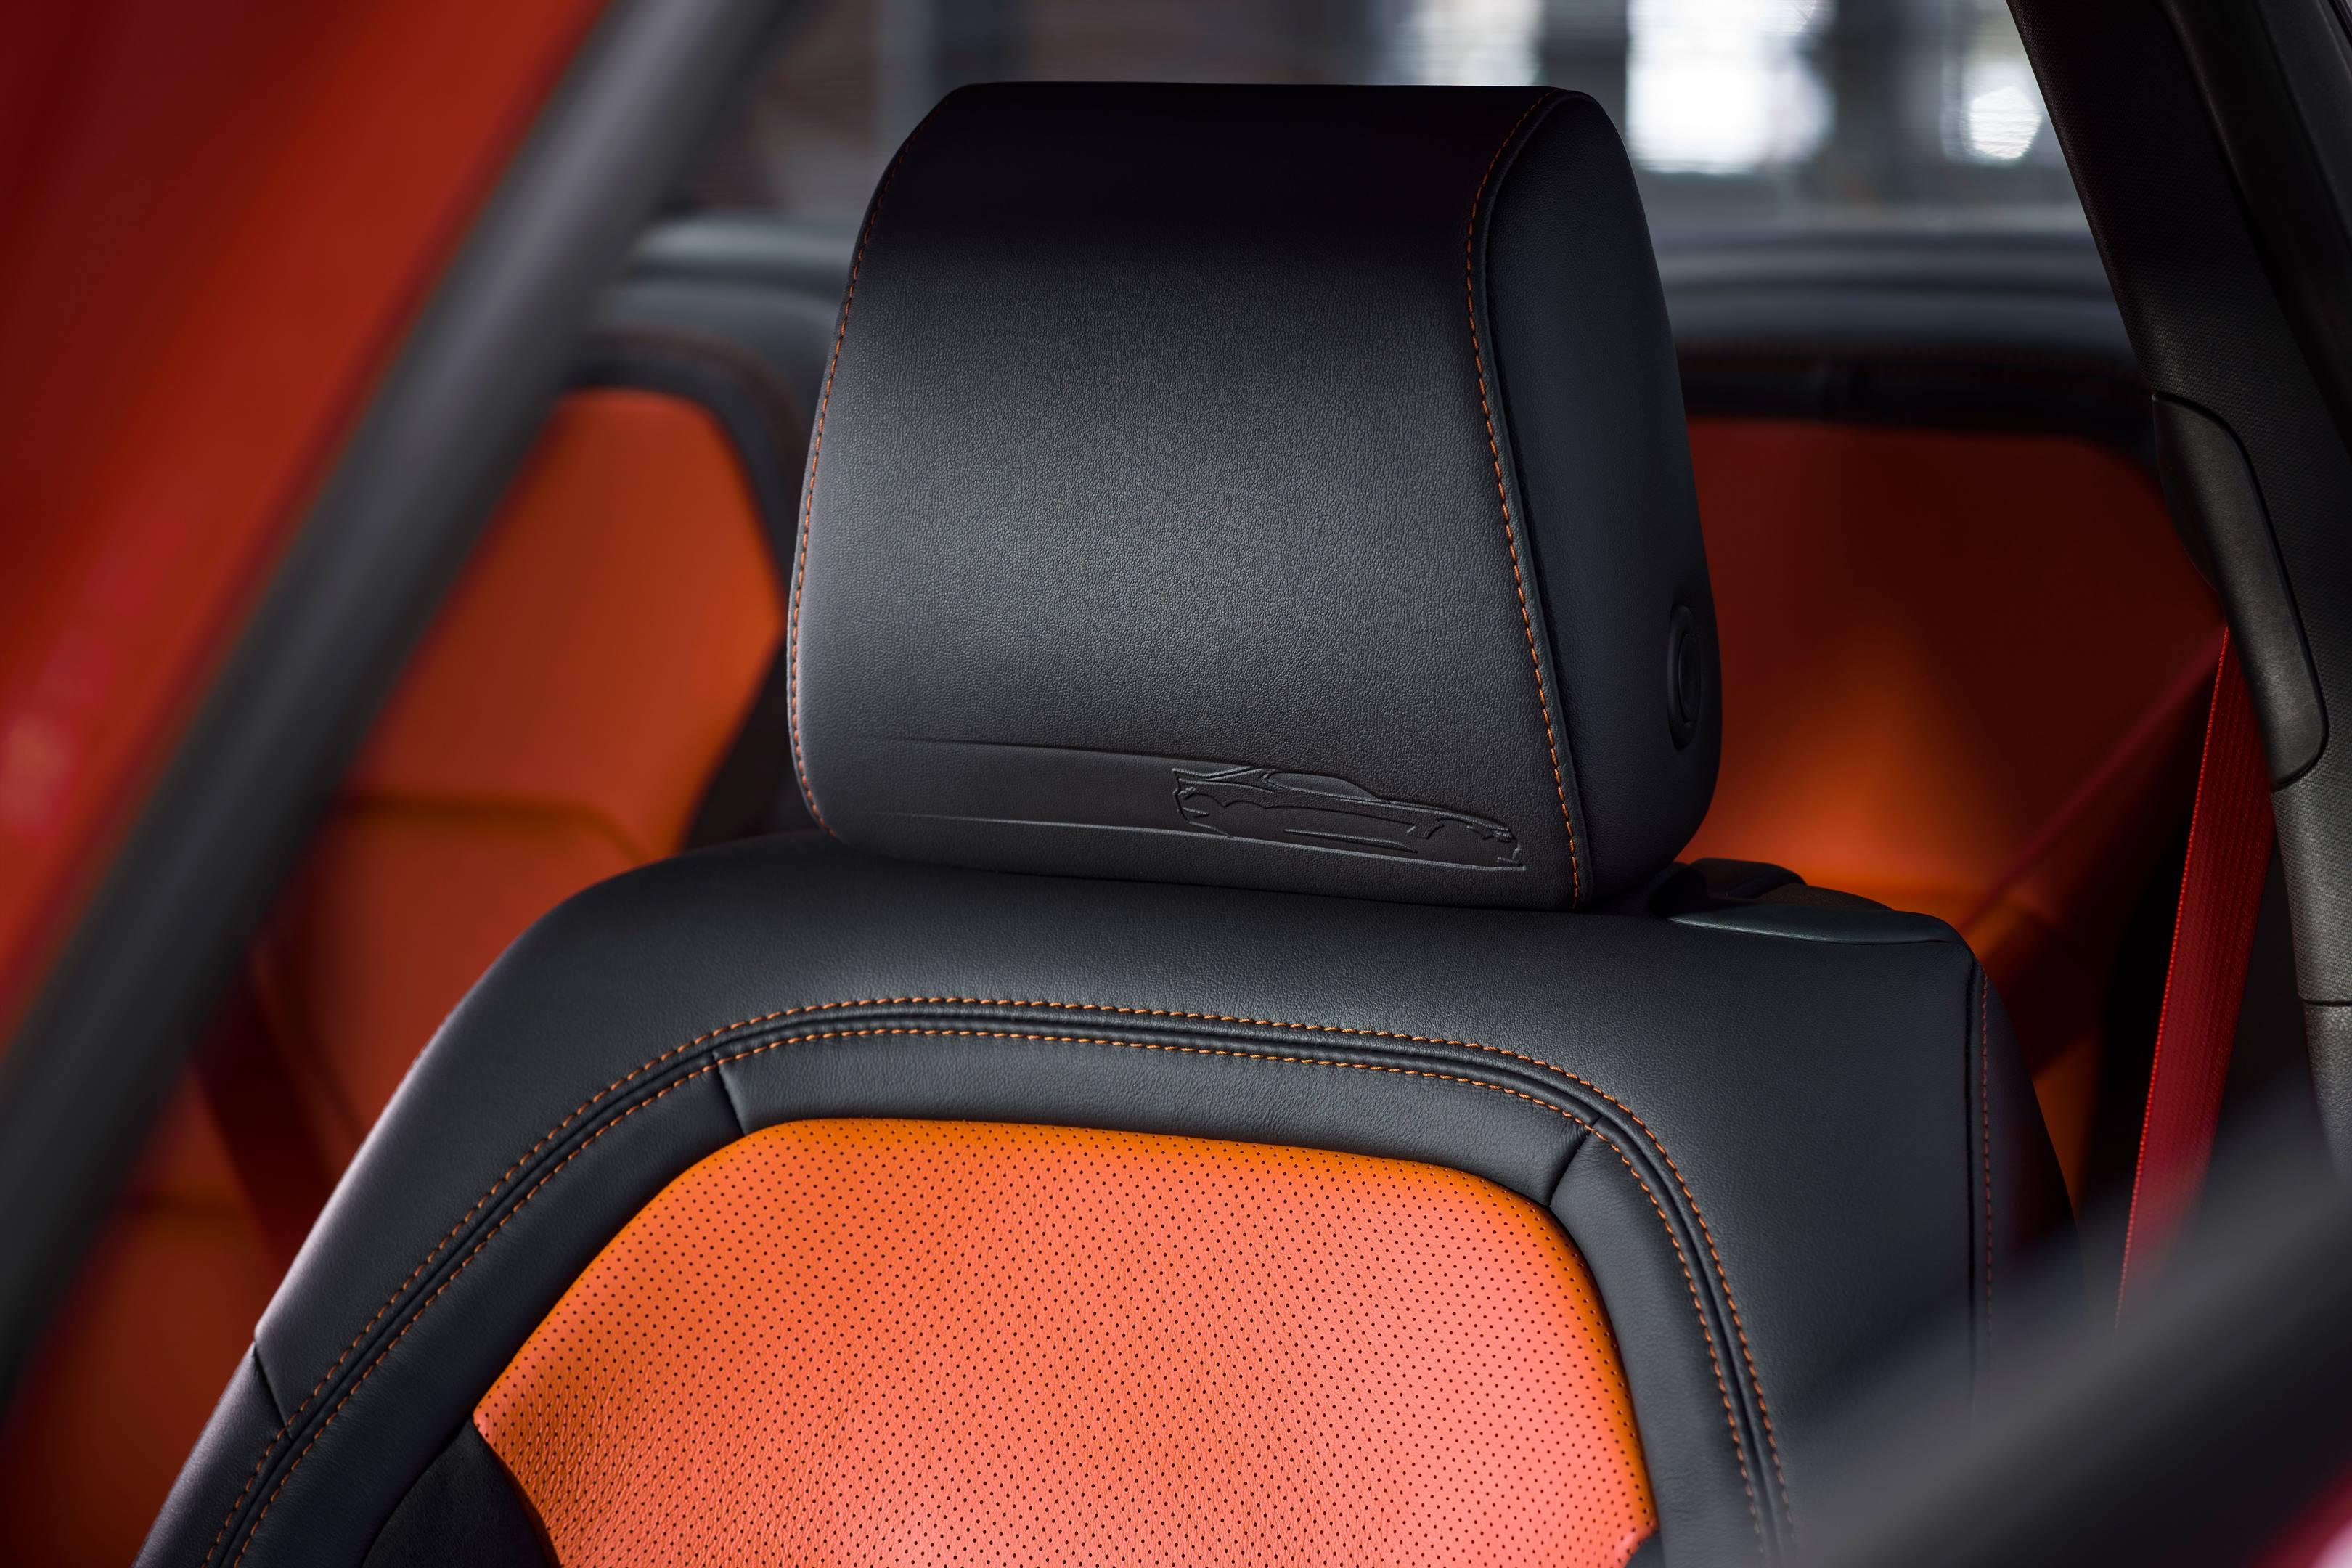 2017 SEMA Chevrolet Hot Wheels Camaro seat detail